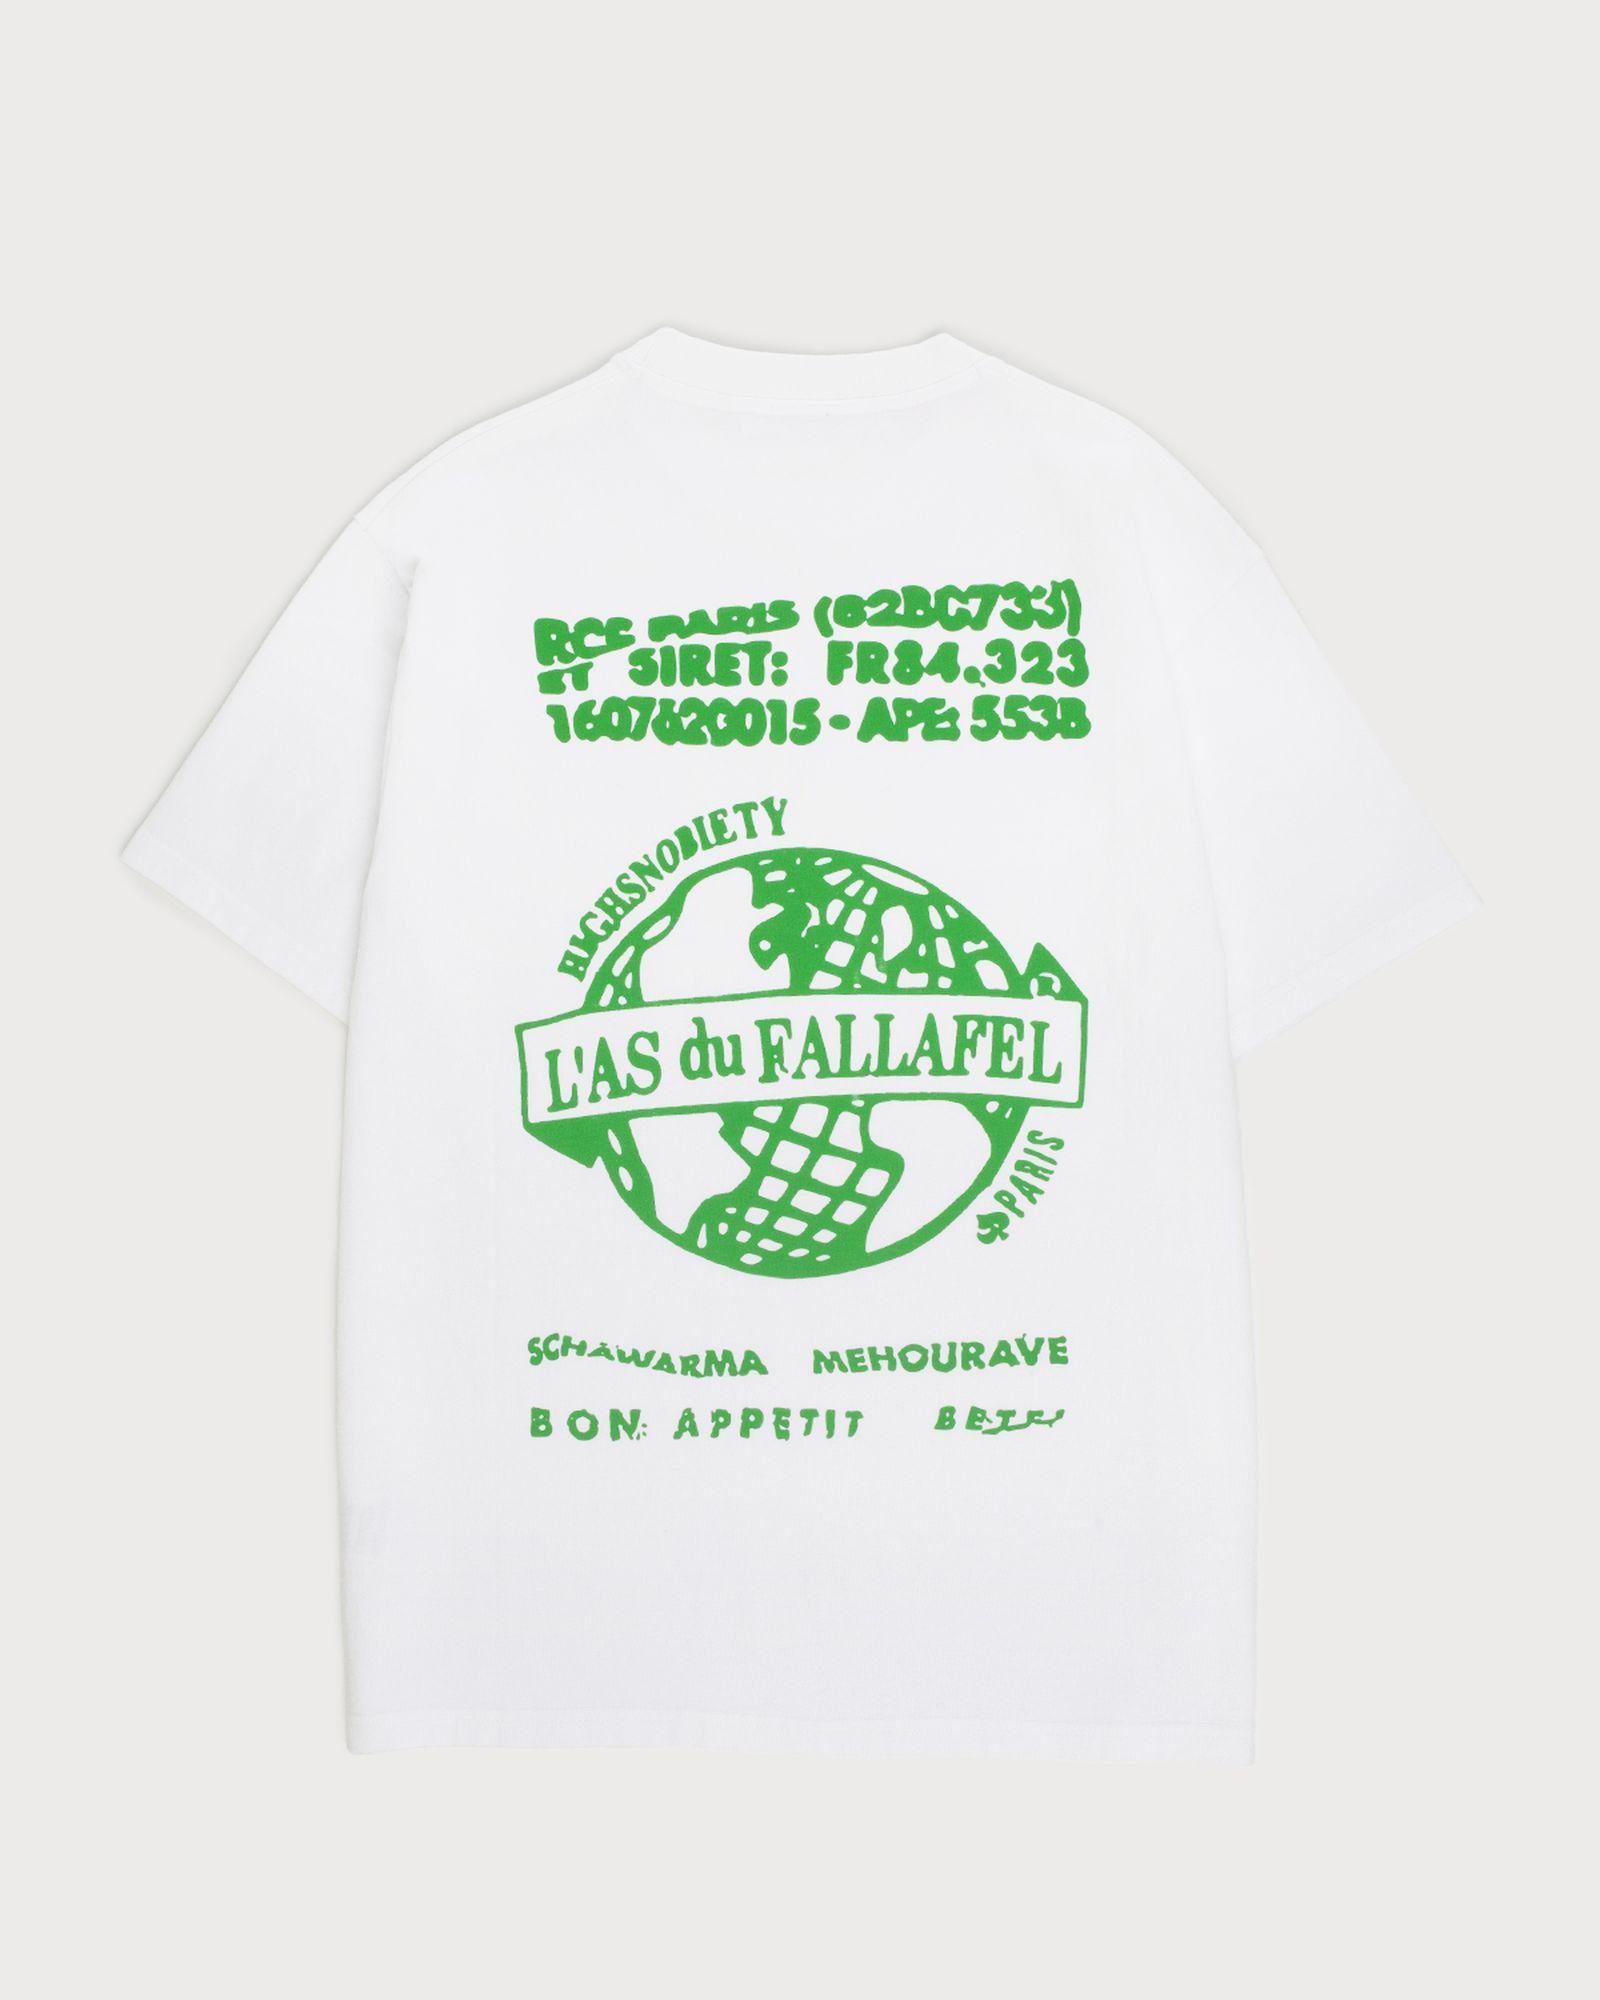 highsnobiety-las-du-fallafel-collection-03